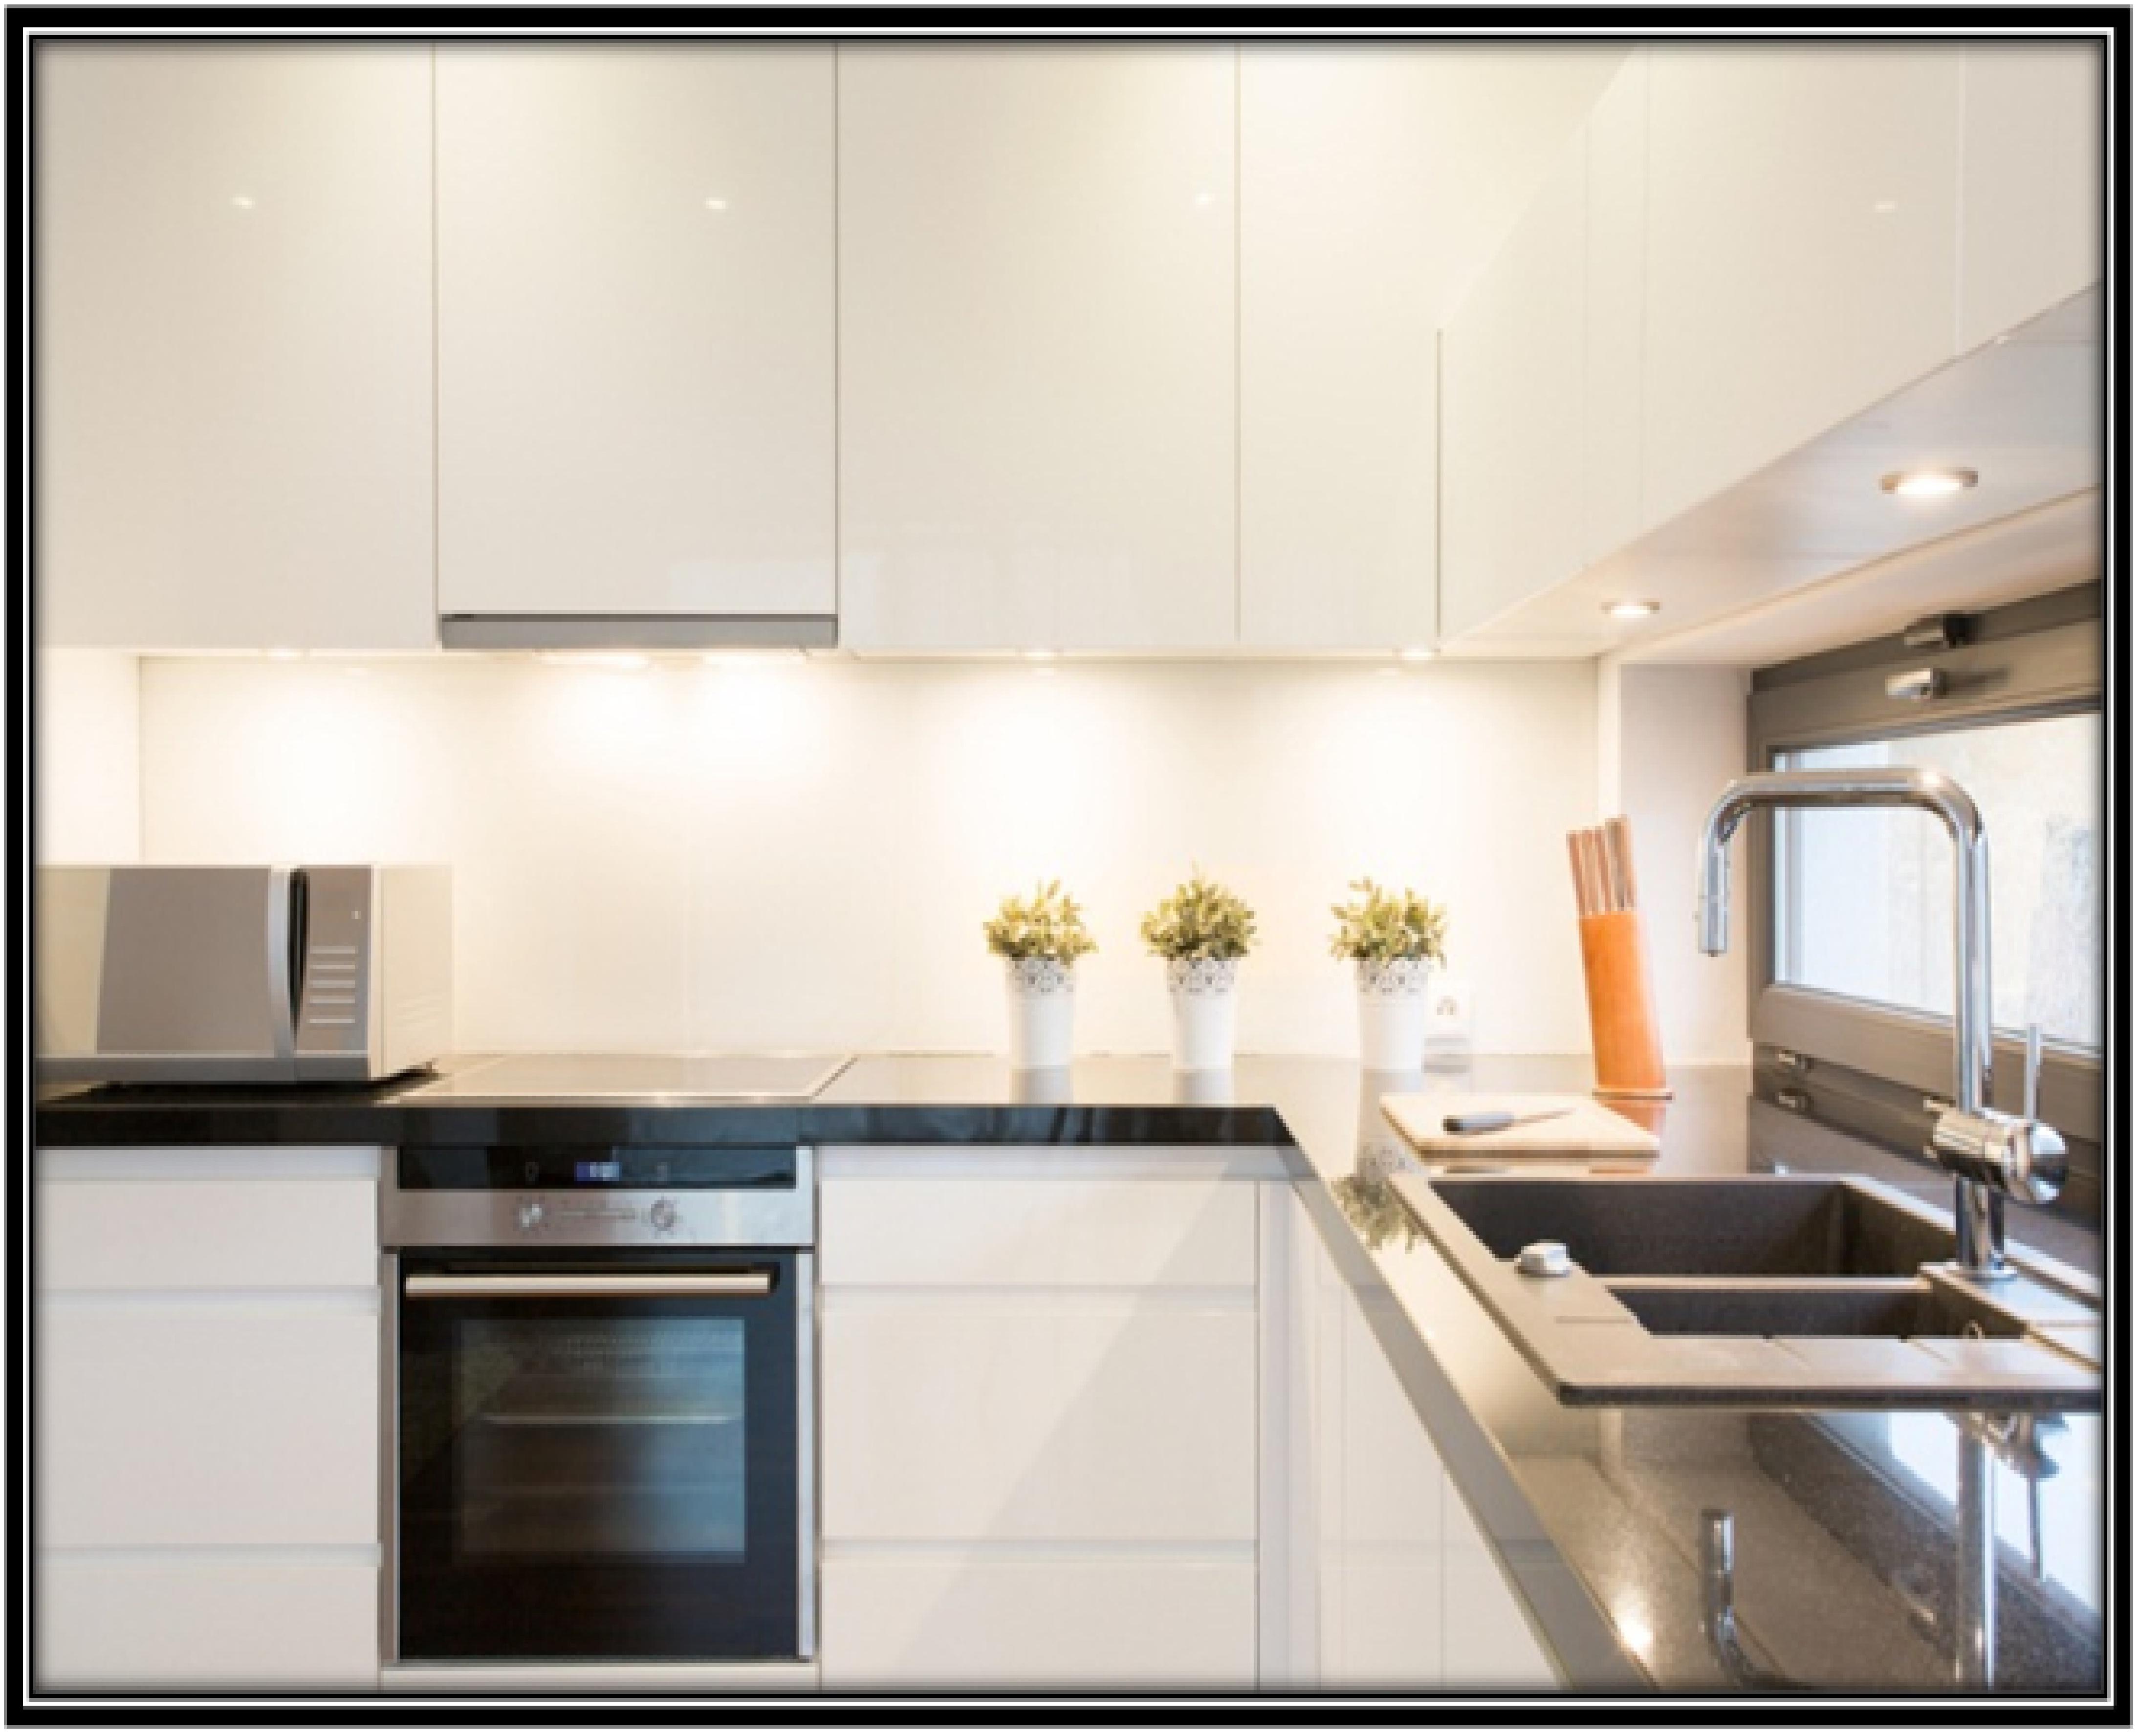 Kitchen Decoration Ideas - Home Decor Ideas